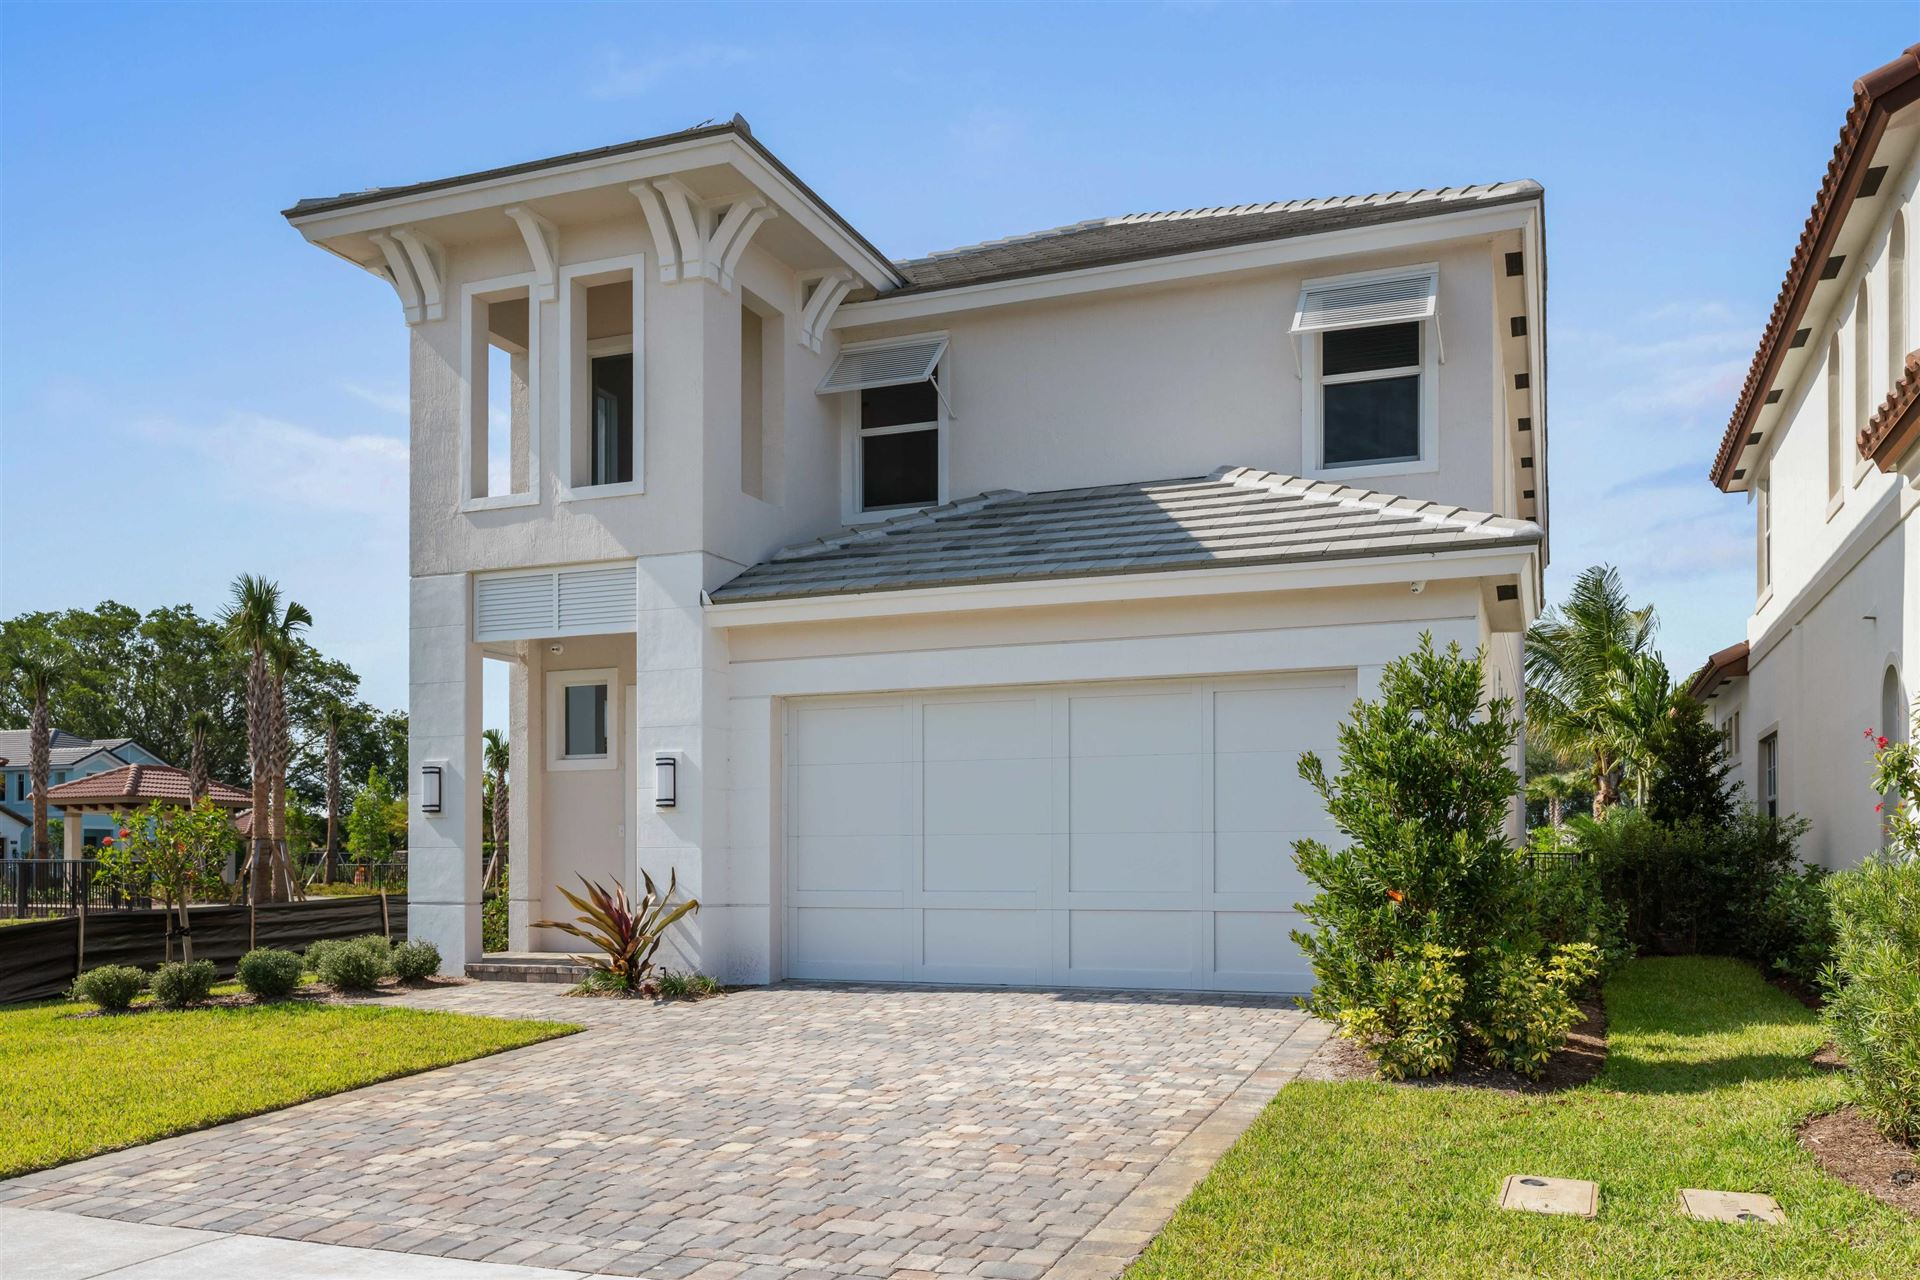 Photo of 150 Bonnette Hunt Club Lane, Palm Beach Gardens, FL 33418 (MLS # RX-10714300)